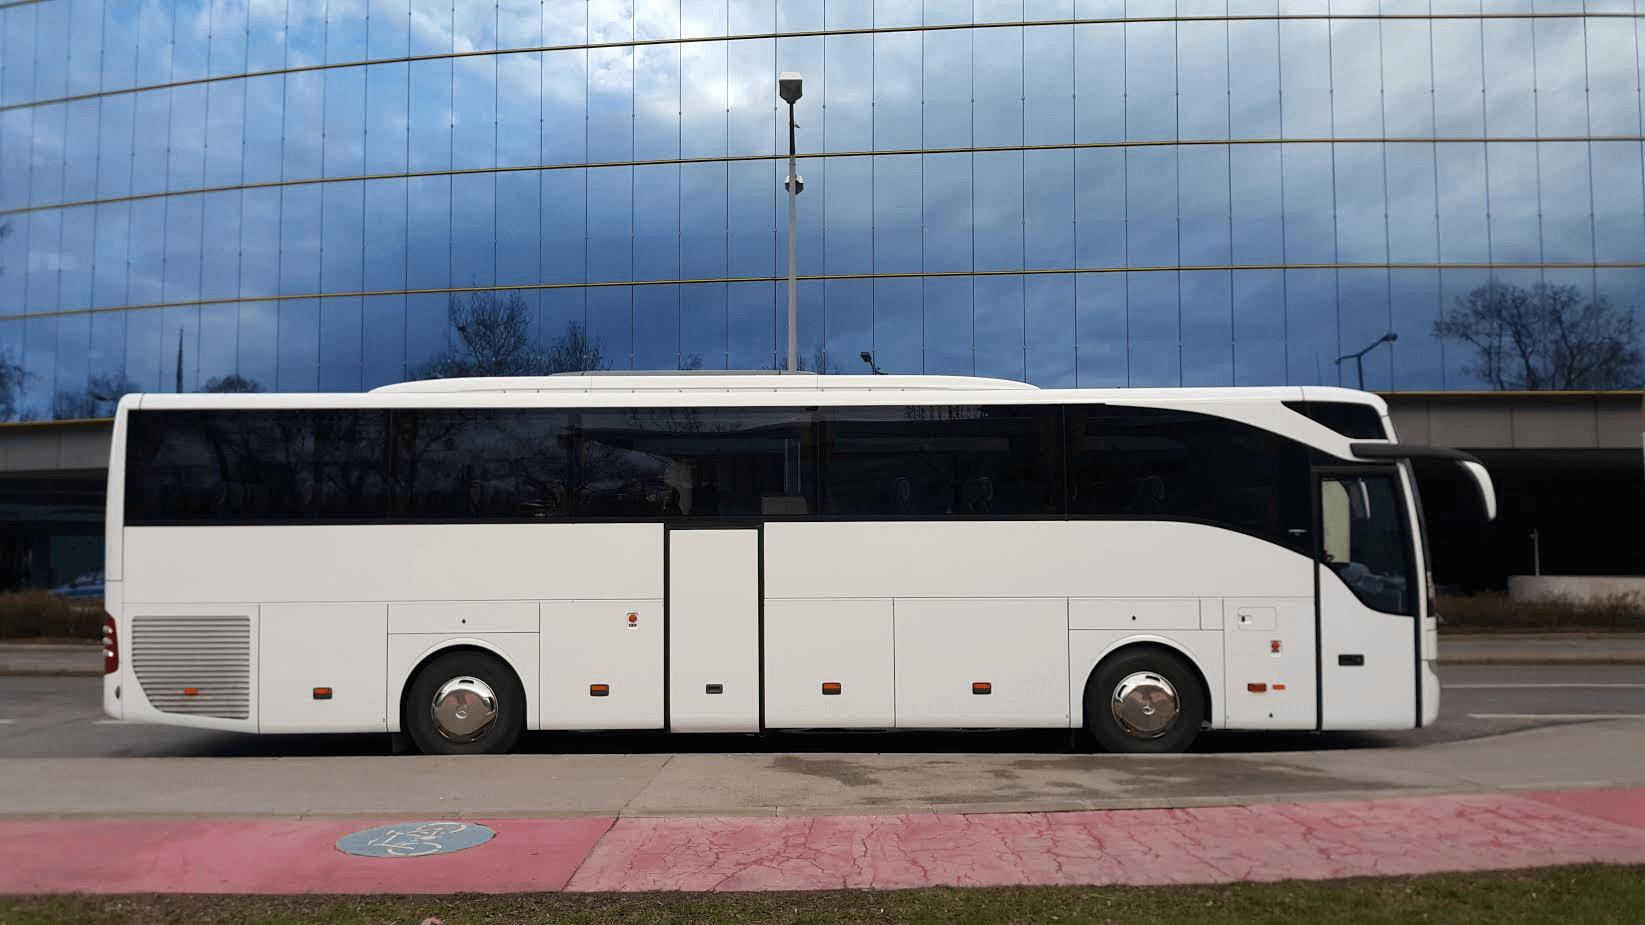 MB-2017-1